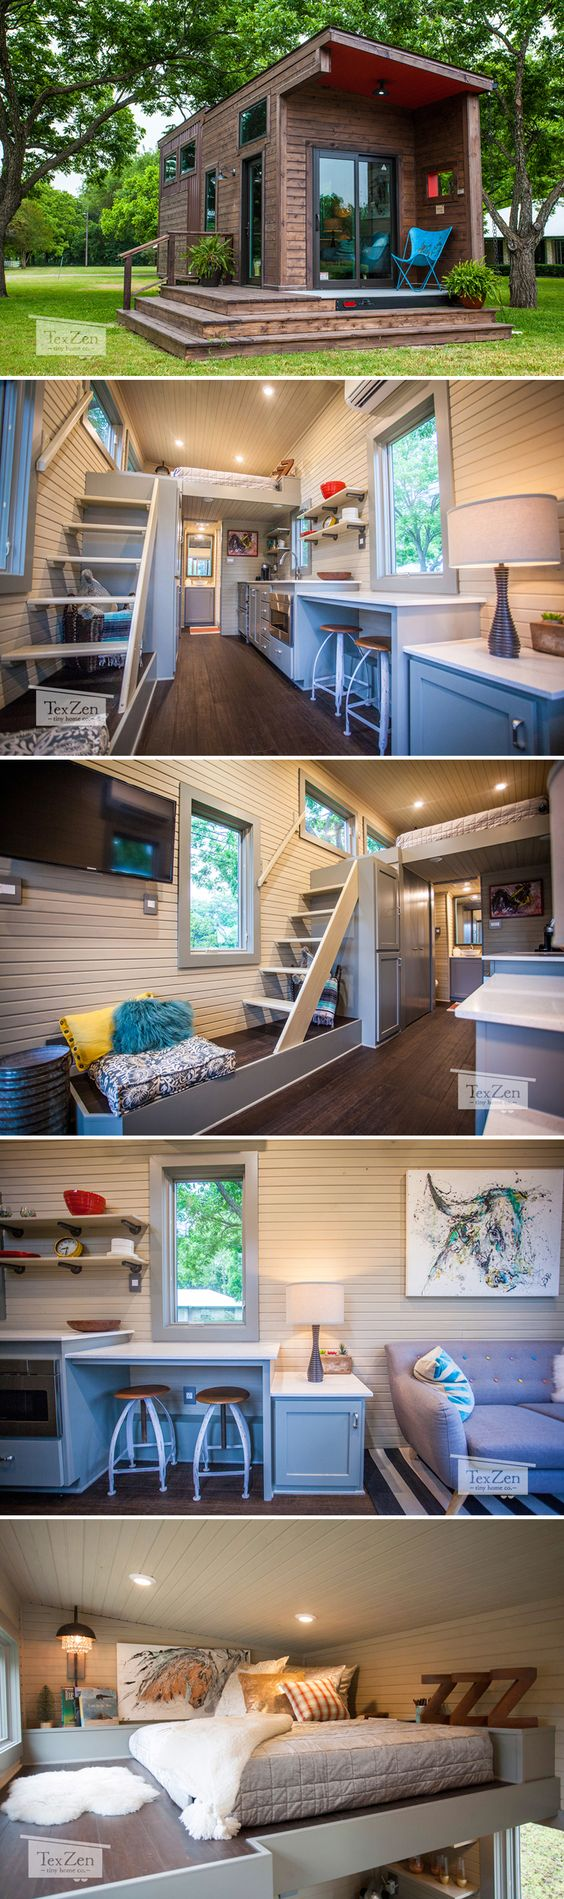 best images about lofts on pinterest